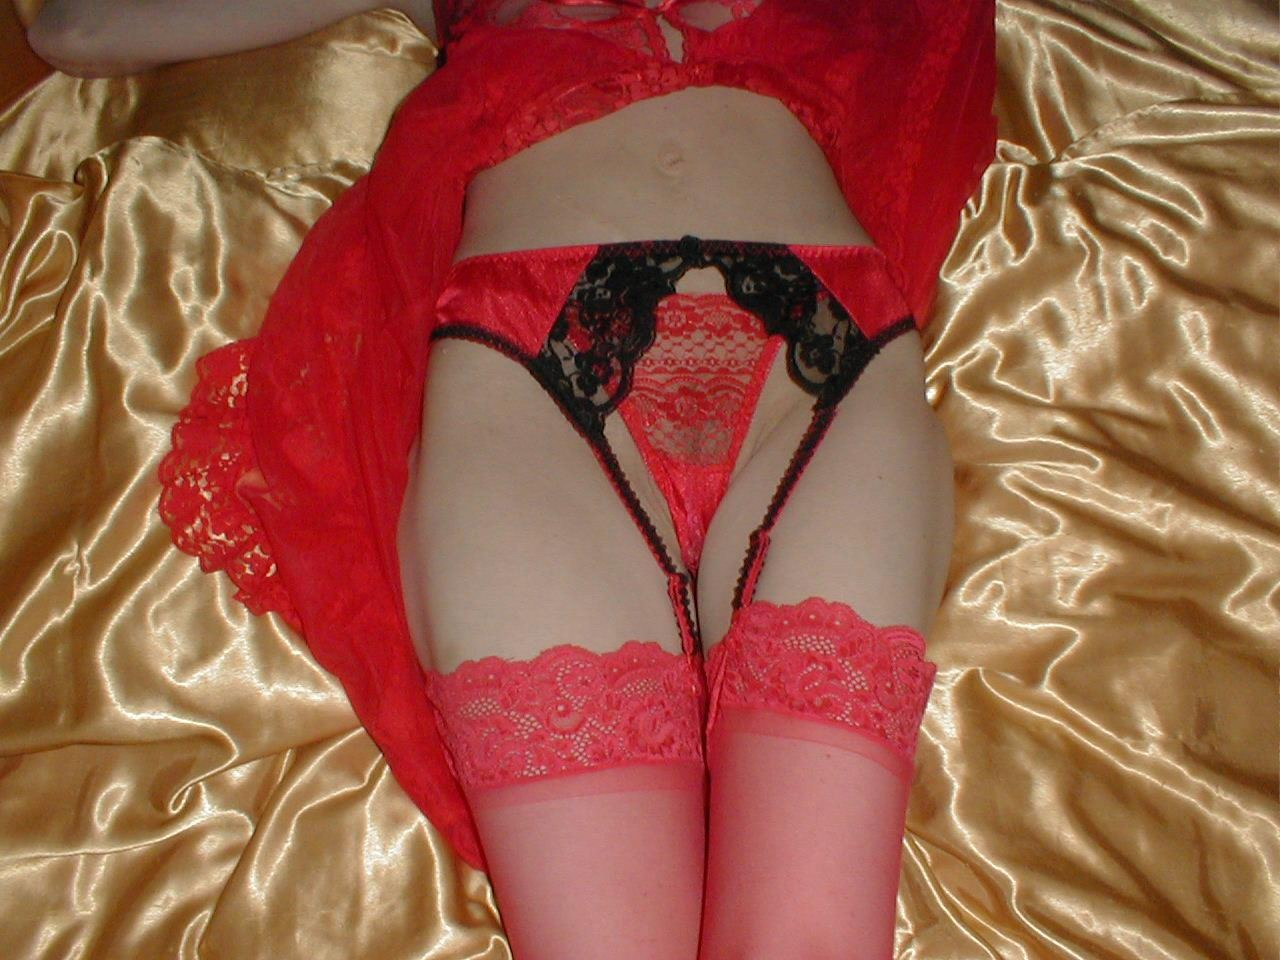 http://pbs-2.adult-empire.com/85/8570/022/pic/2.jpg